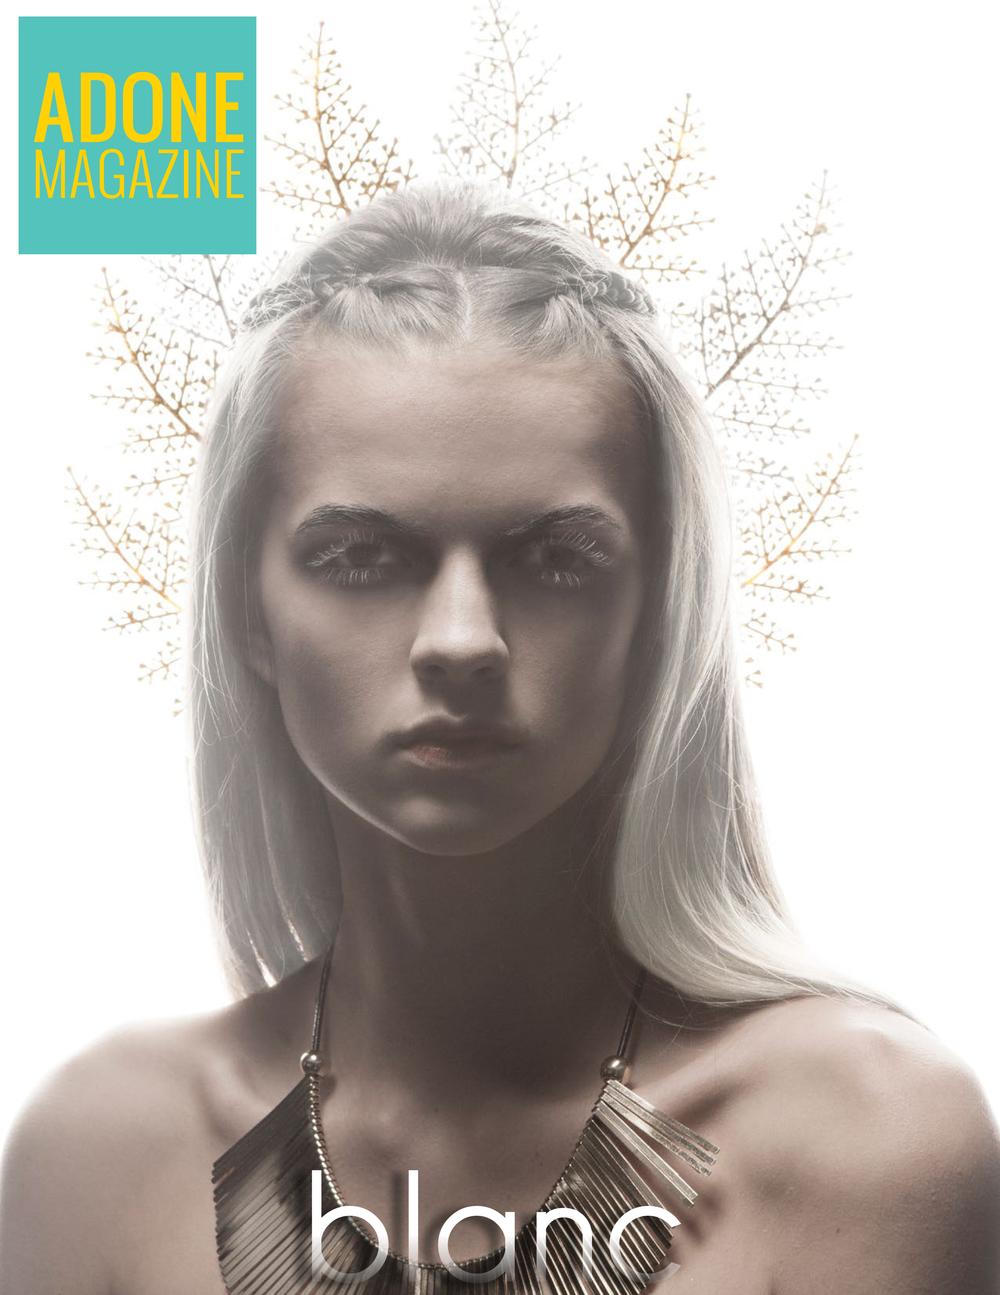 ADONE MAGAZINE - Blanc